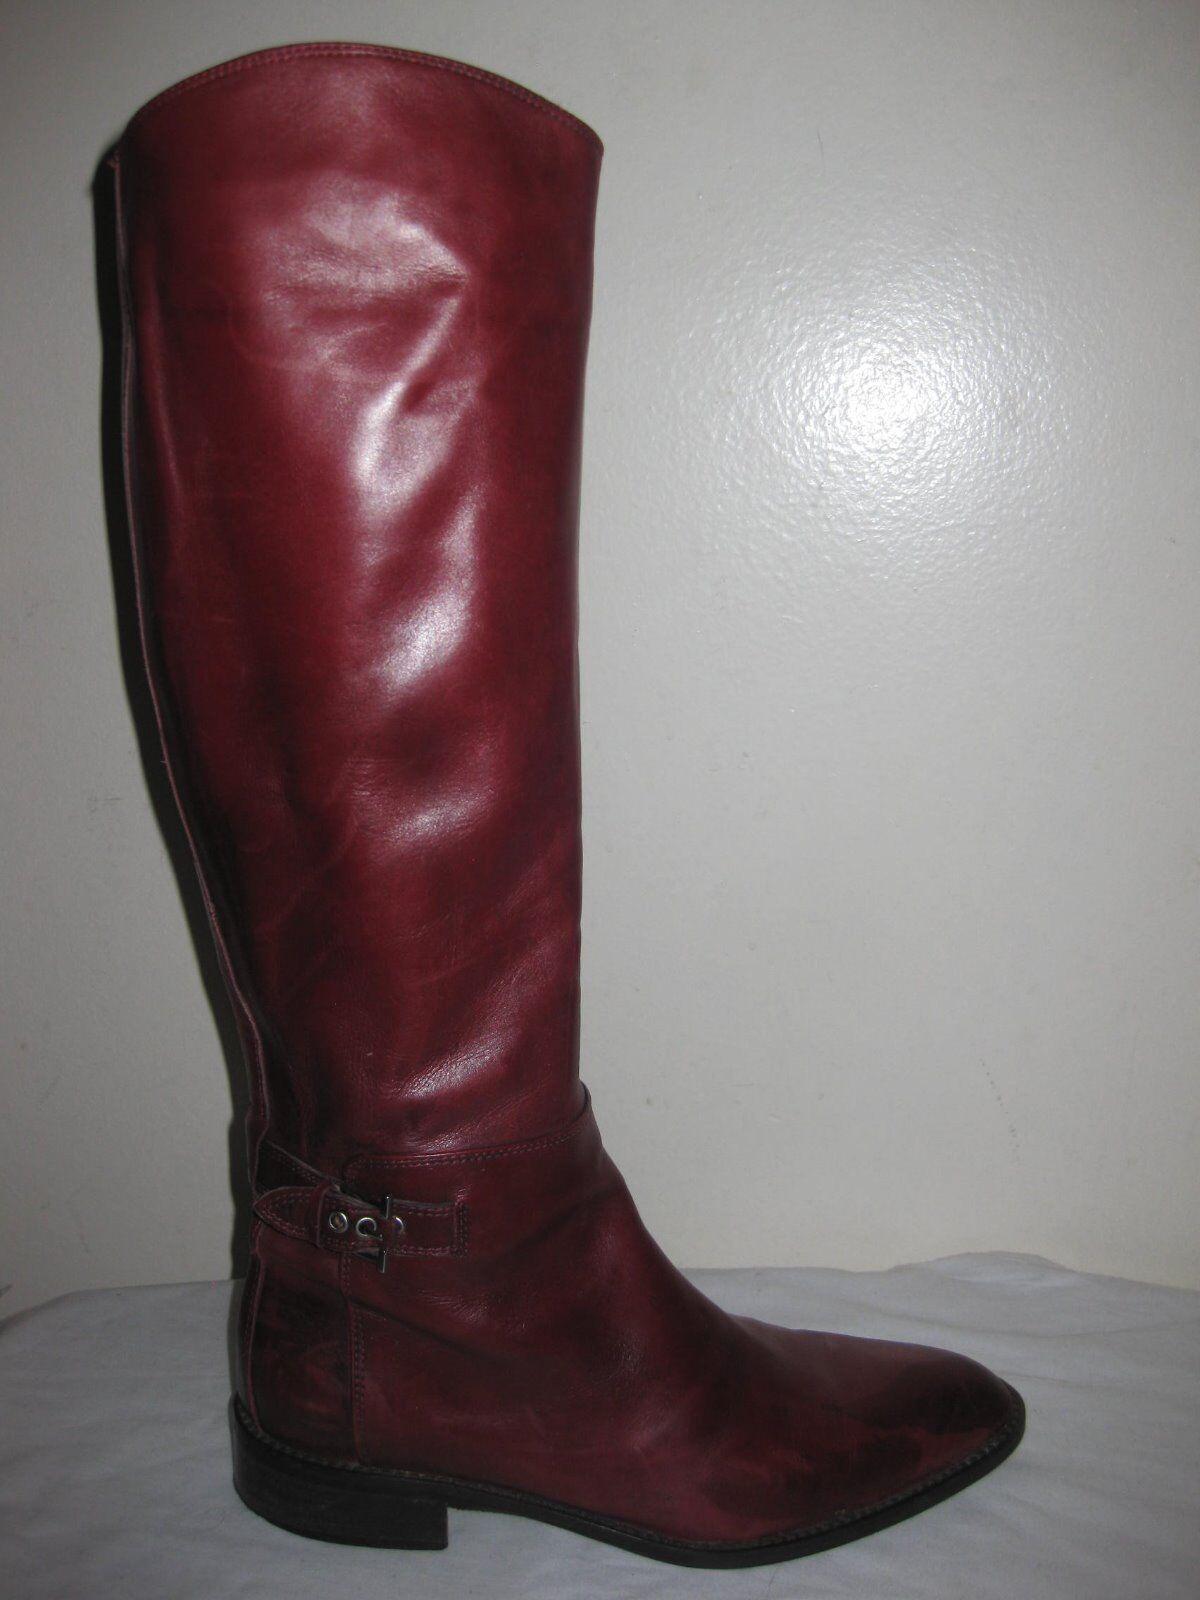 A. TESTONI  Damenschuhe Leder Burgundy Stiefel Schuhes Sz 36.5 / 6, Made In ITALY